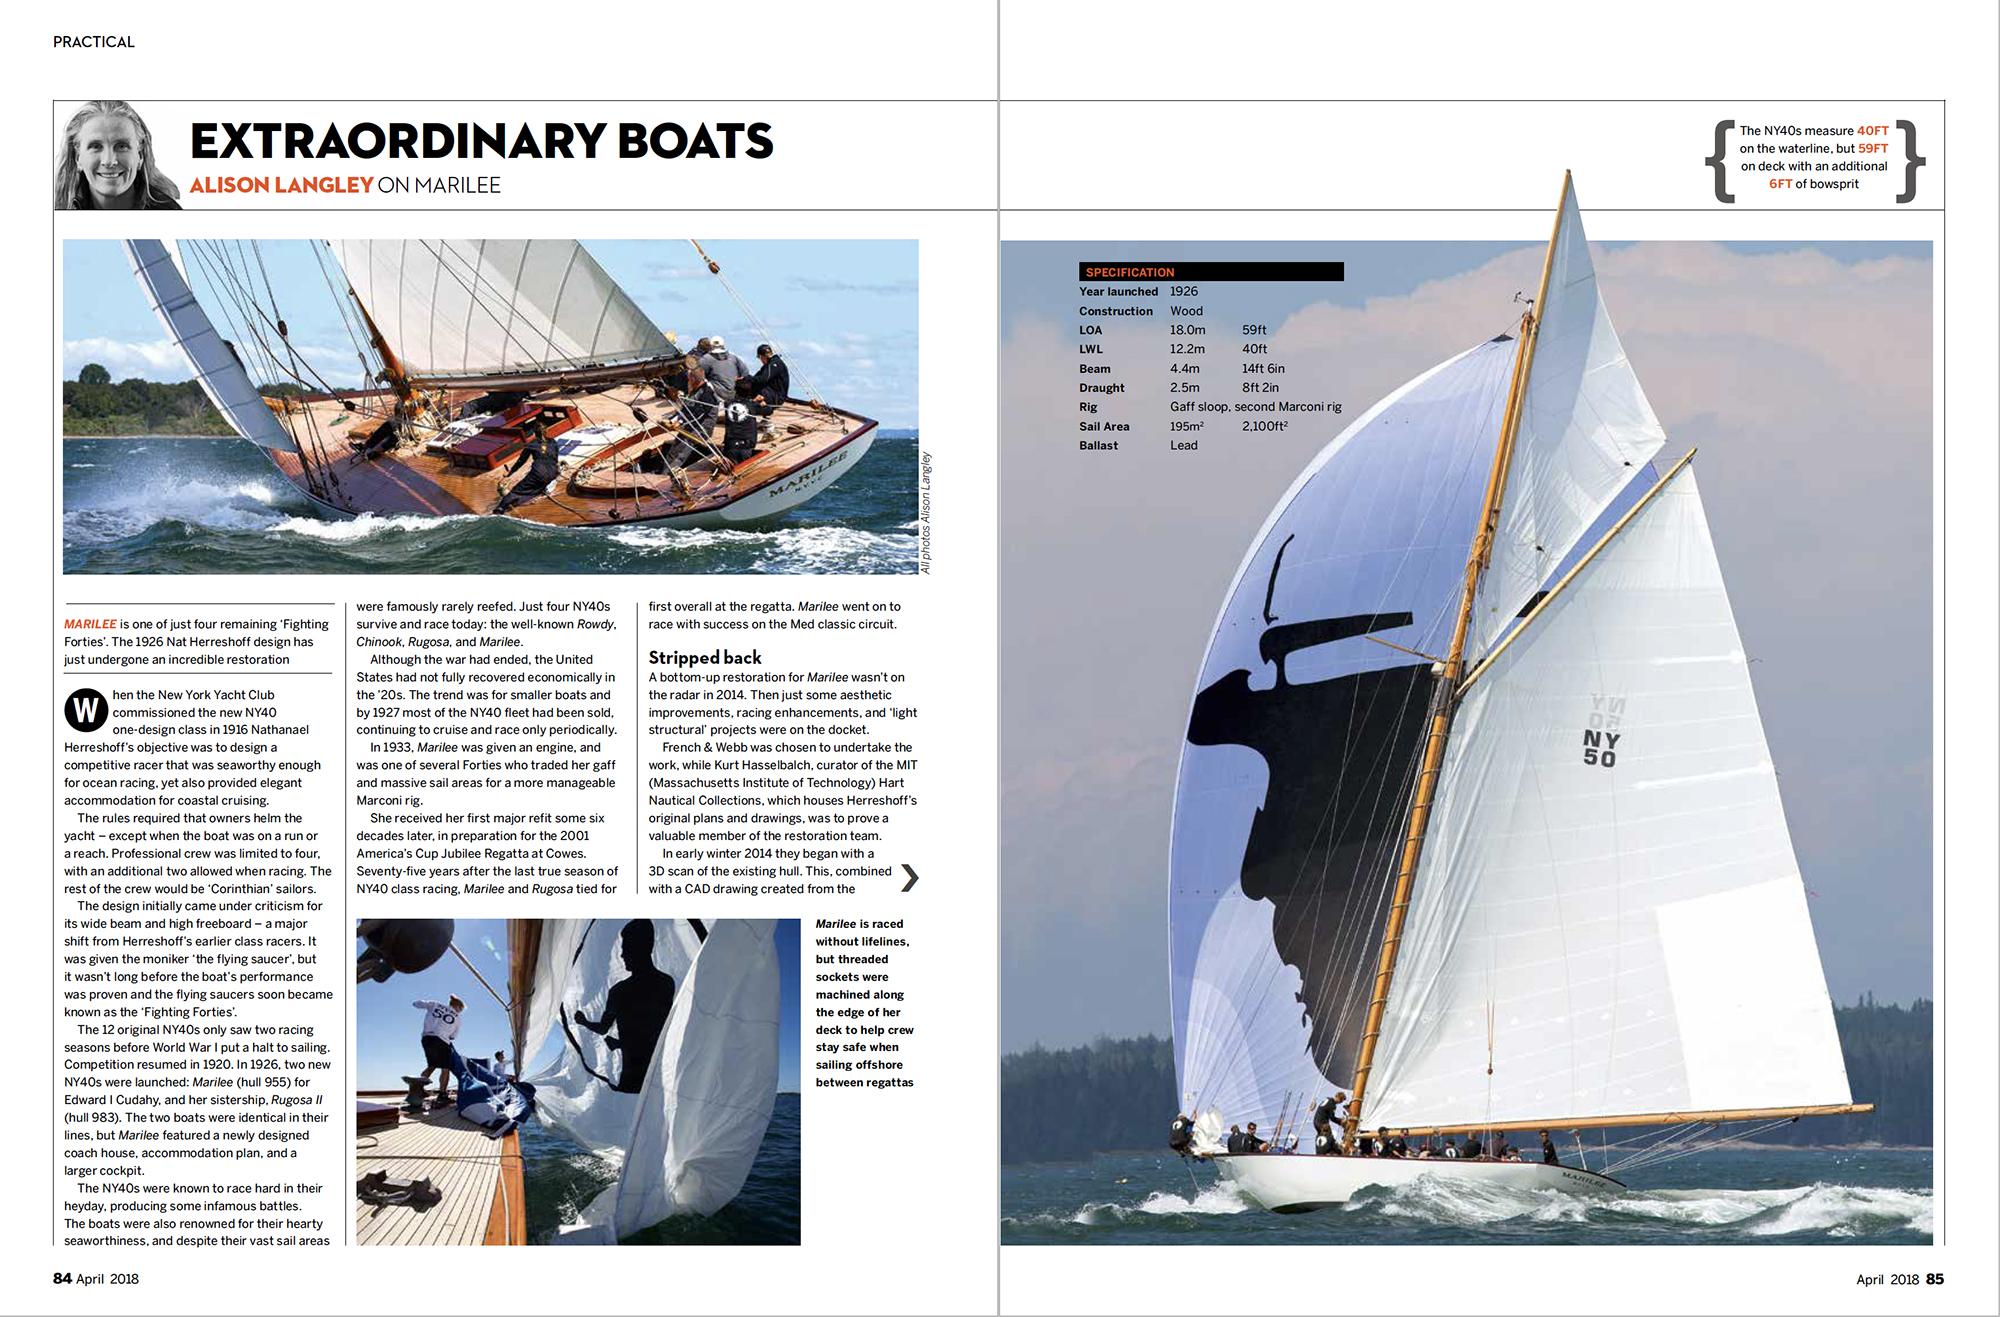 exboats_2000_1.jpg